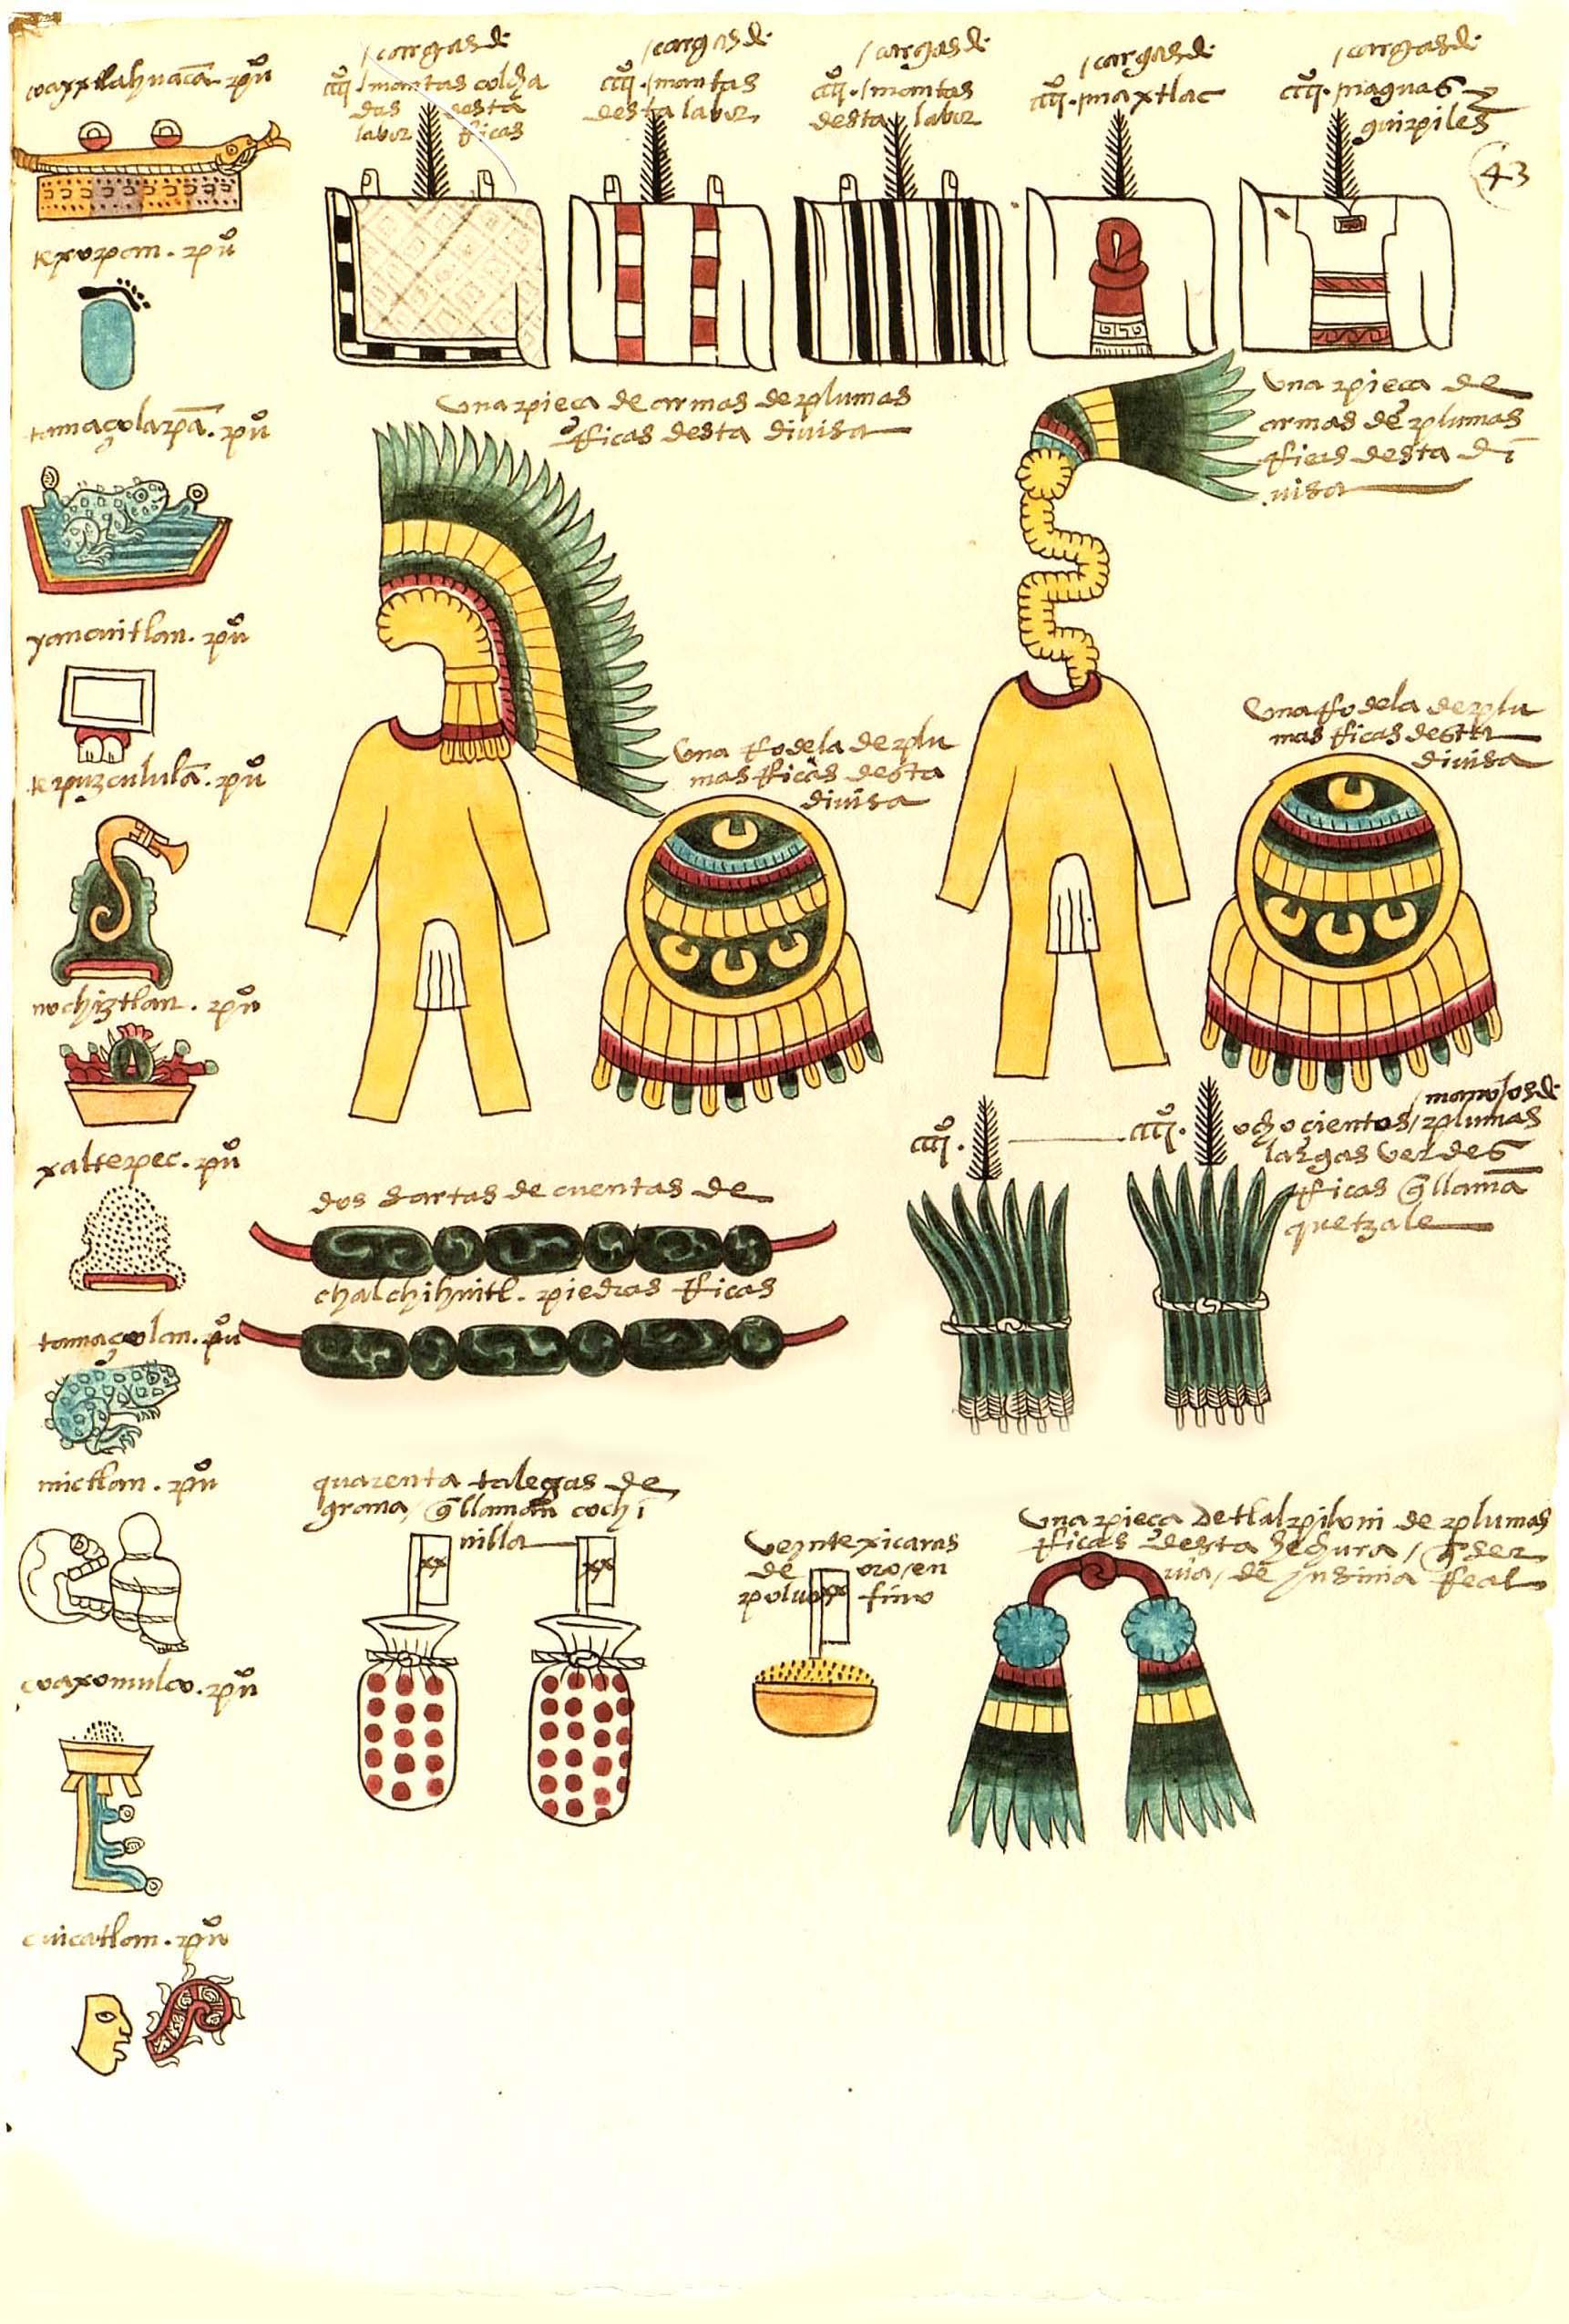 Codex Mendoza Teposcolula tribute